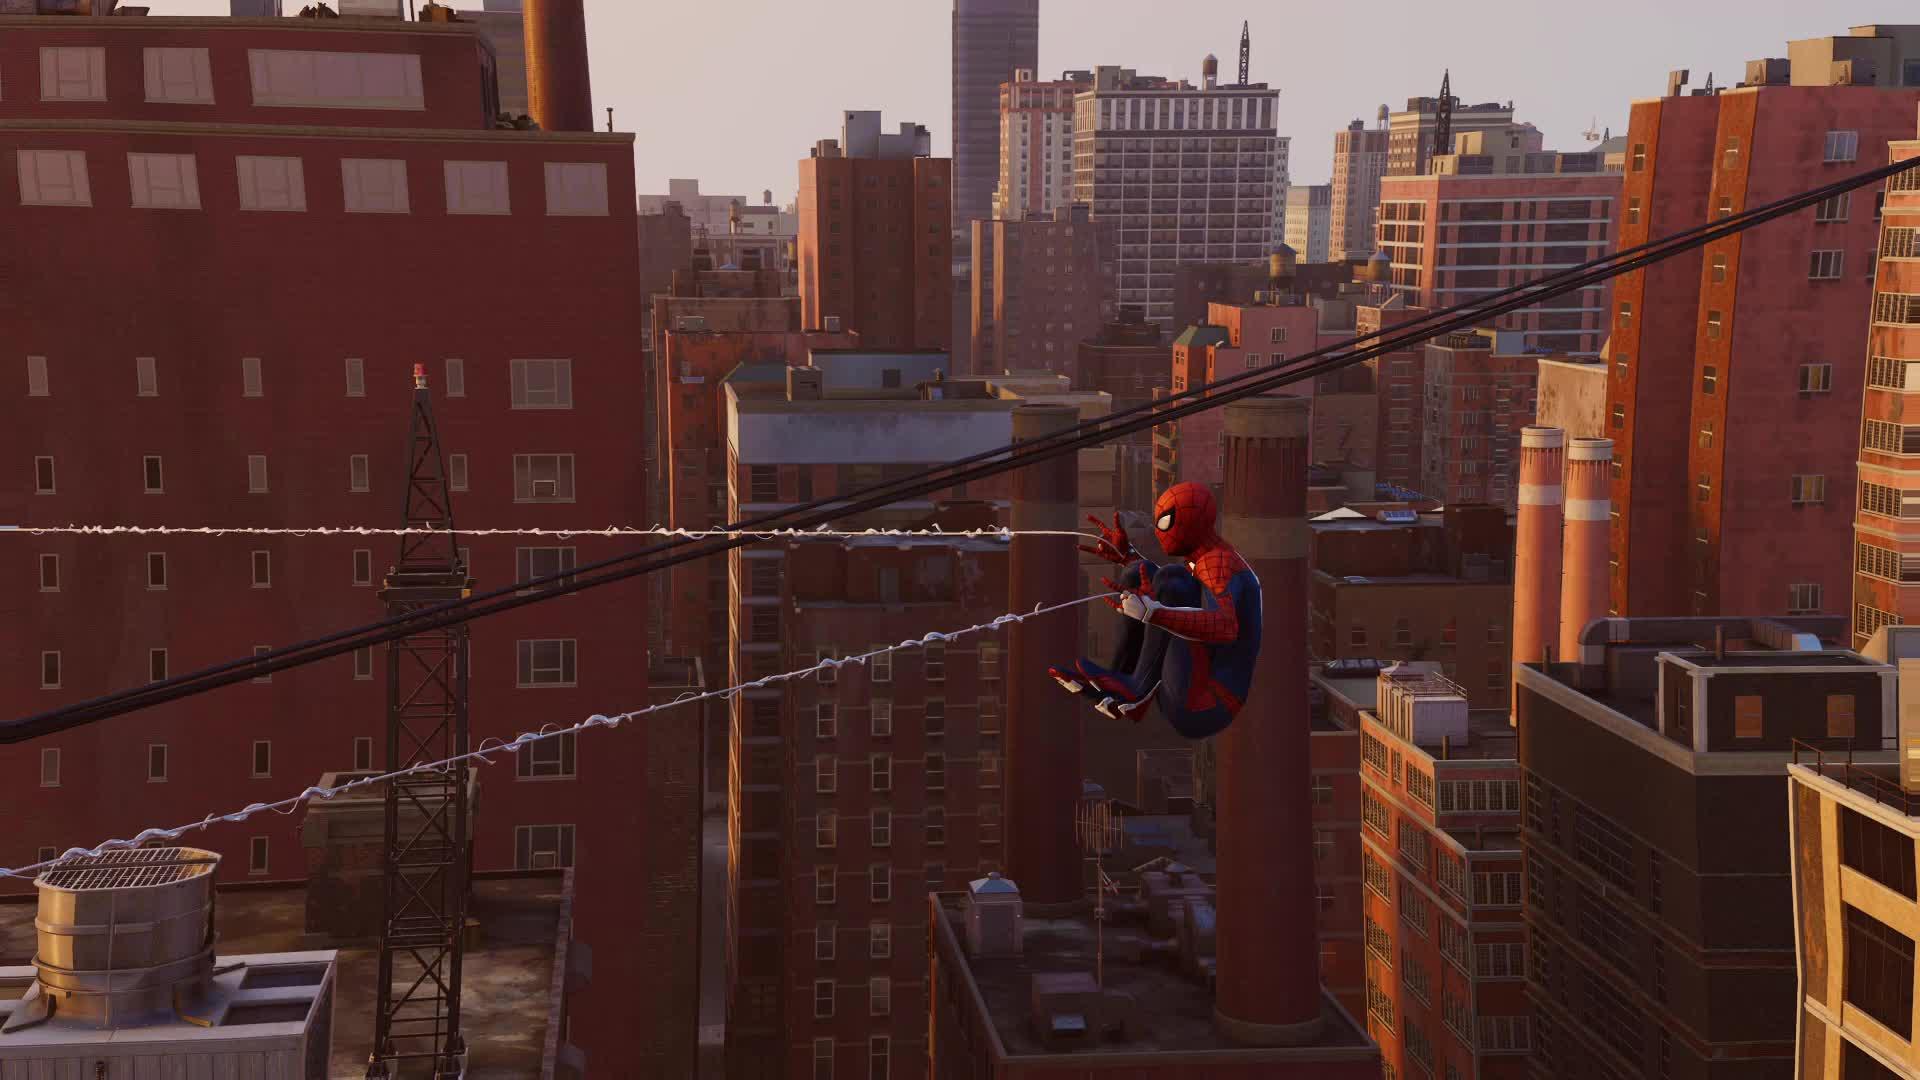 marvel, playstation, playstation 4, ps4, ps4share, spider-man, spiderman, Spider-Man web detail GIFs